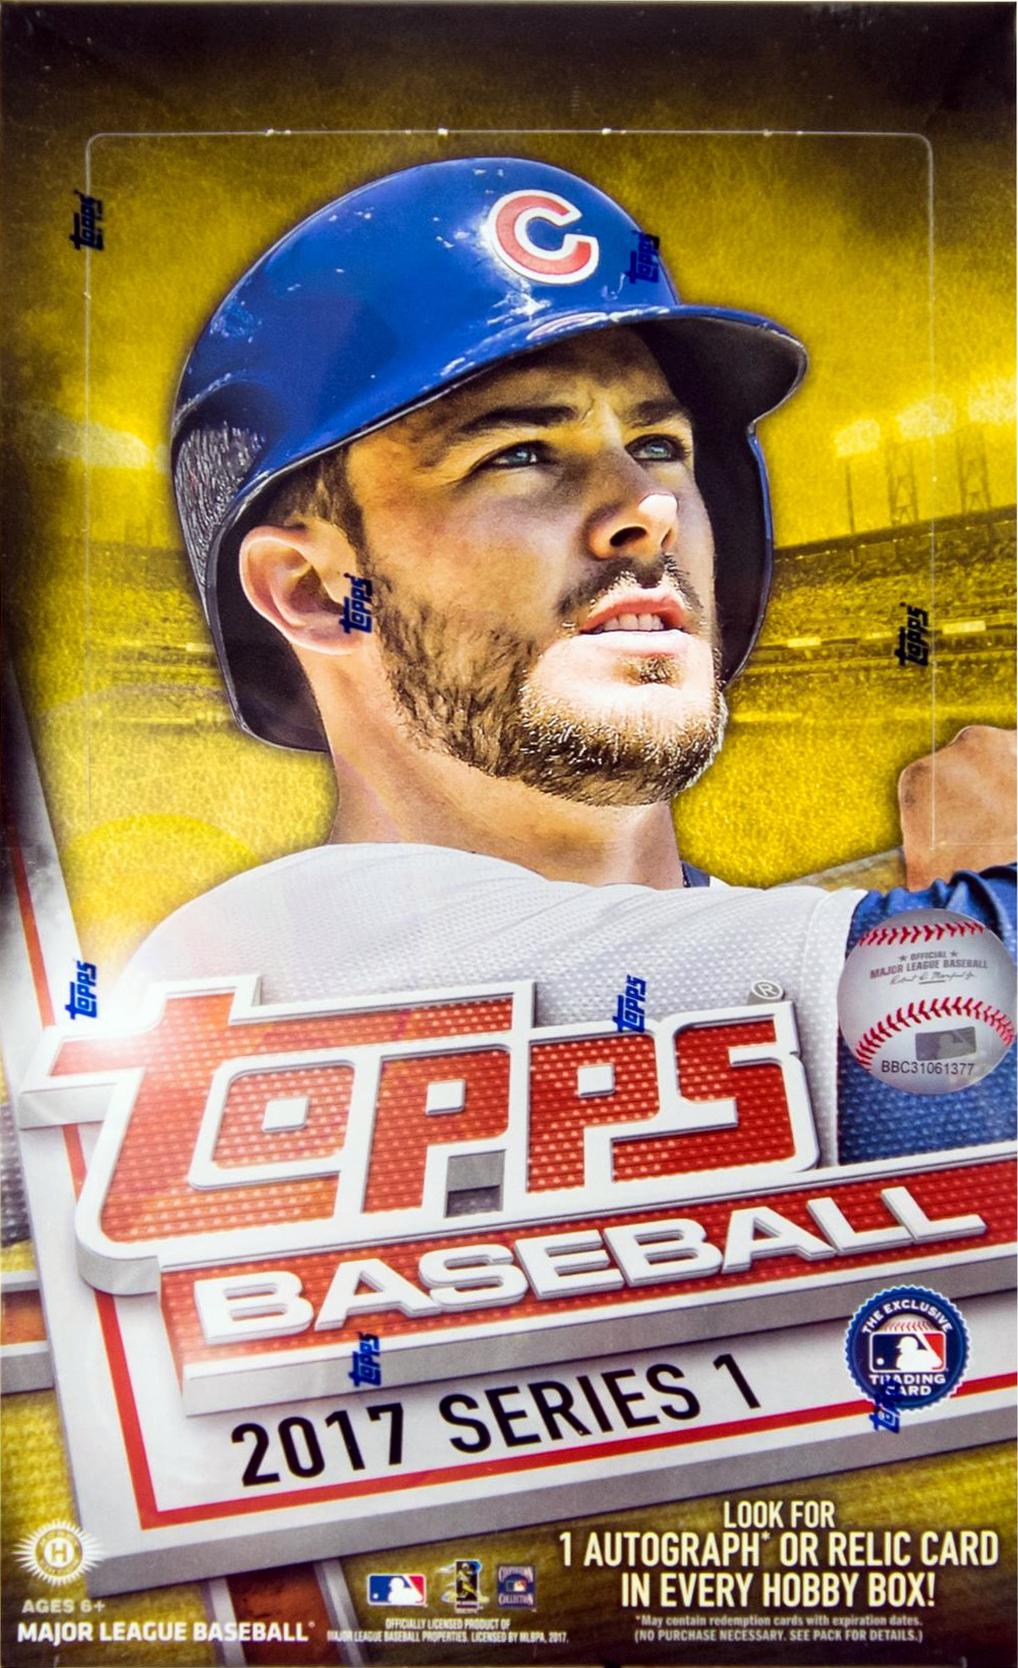 2017 Topps Baseball Series 1 Hobby Box Sports Cards Trading